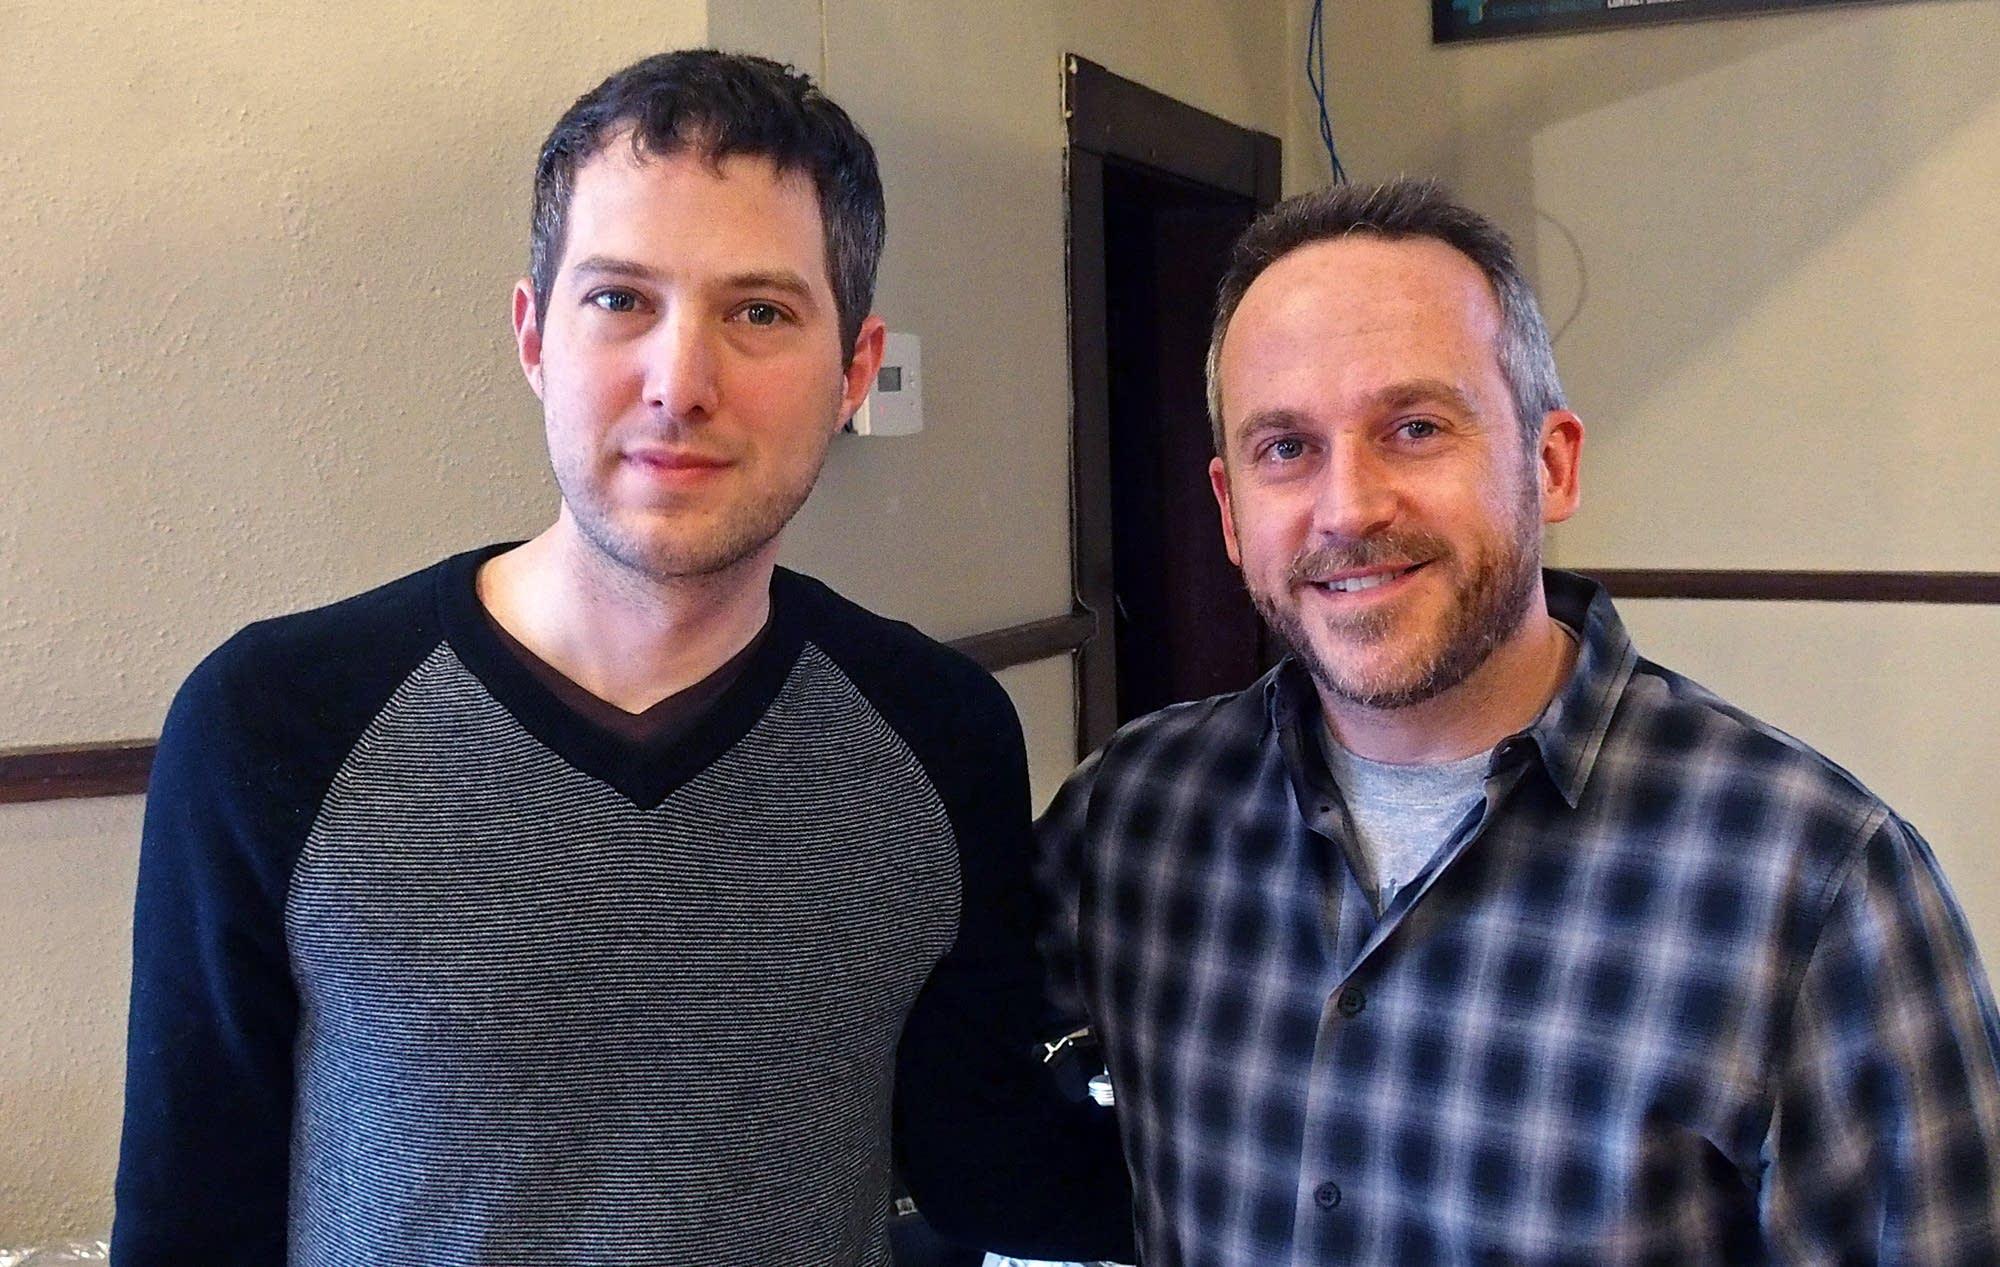 Playwrights Alex Levy and Gabriel Greene